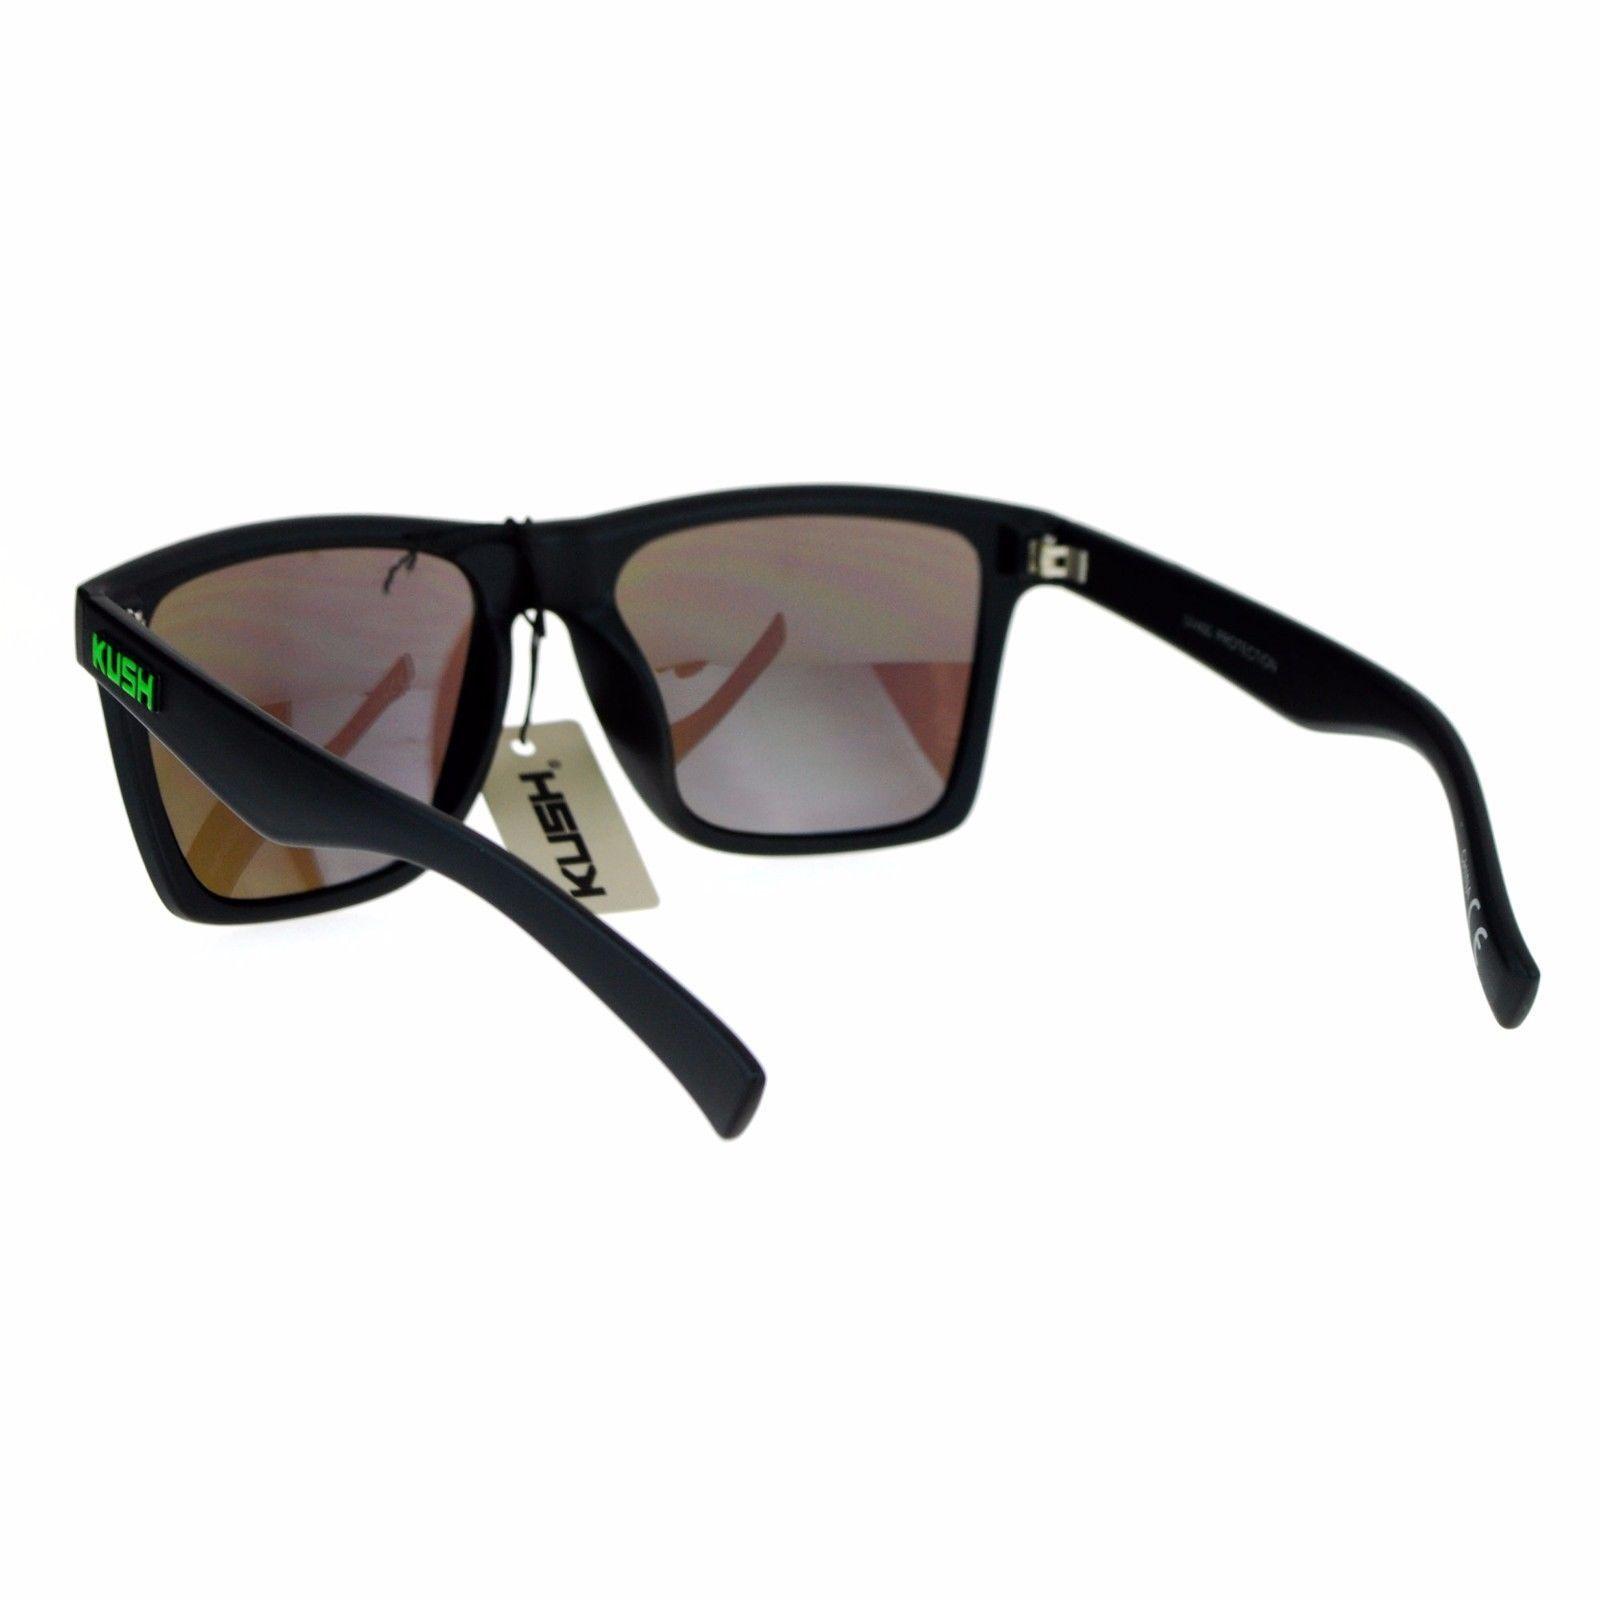 KUSH Sunglasses Square Rectangular Matte Black Mirror Lens UV 400